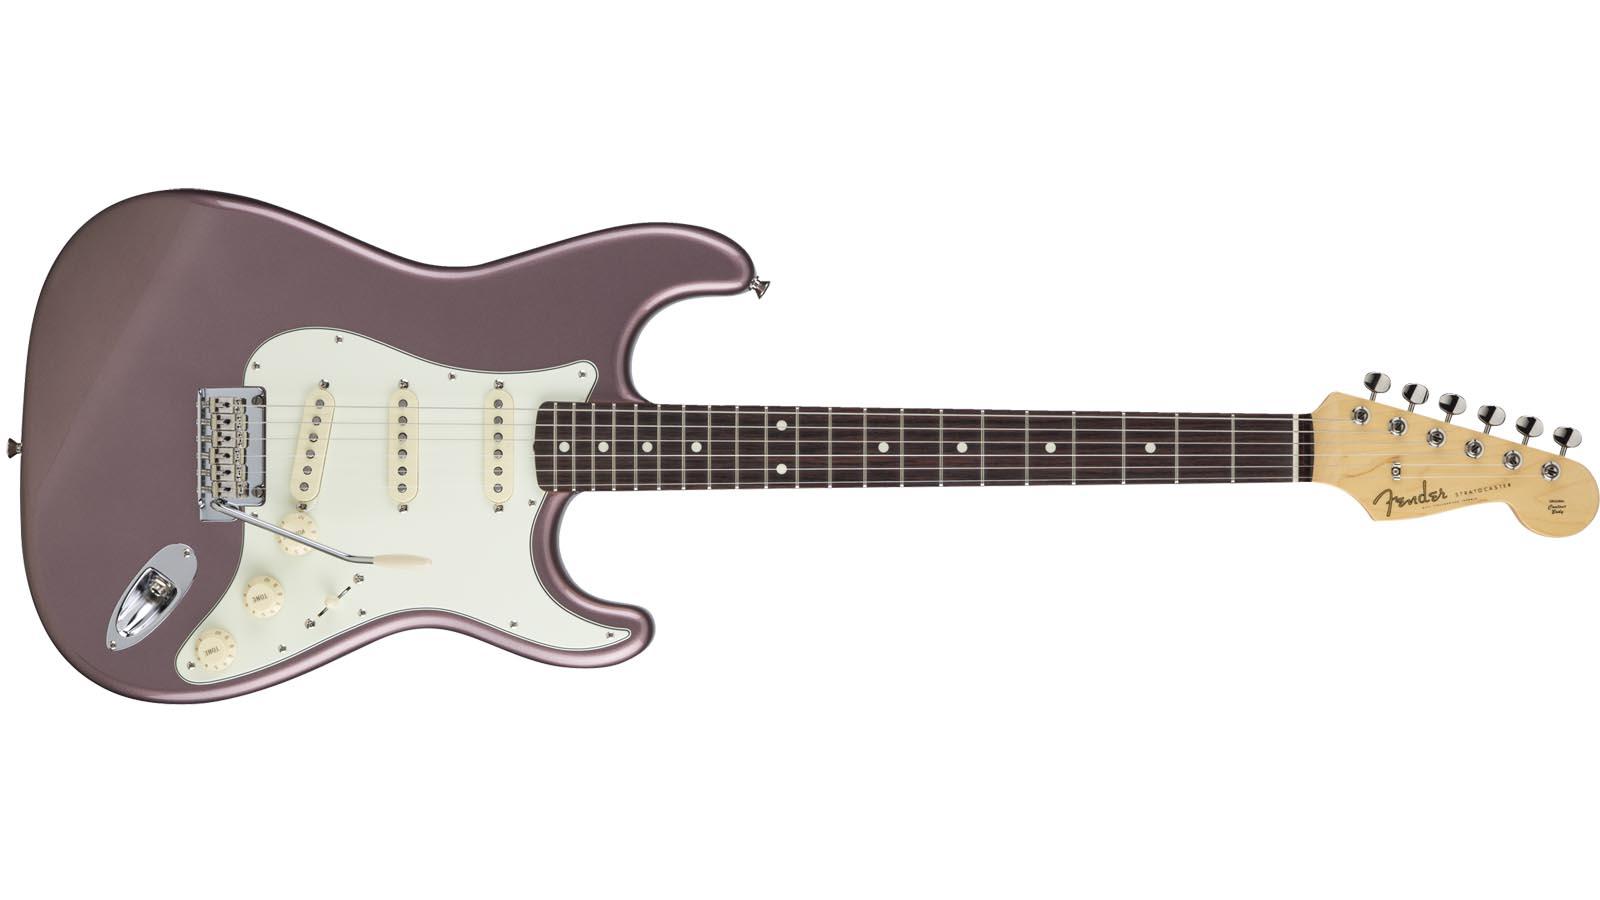 Fender MIJ Hybrid 60s Strat RW BMM Burg Mist Metalic